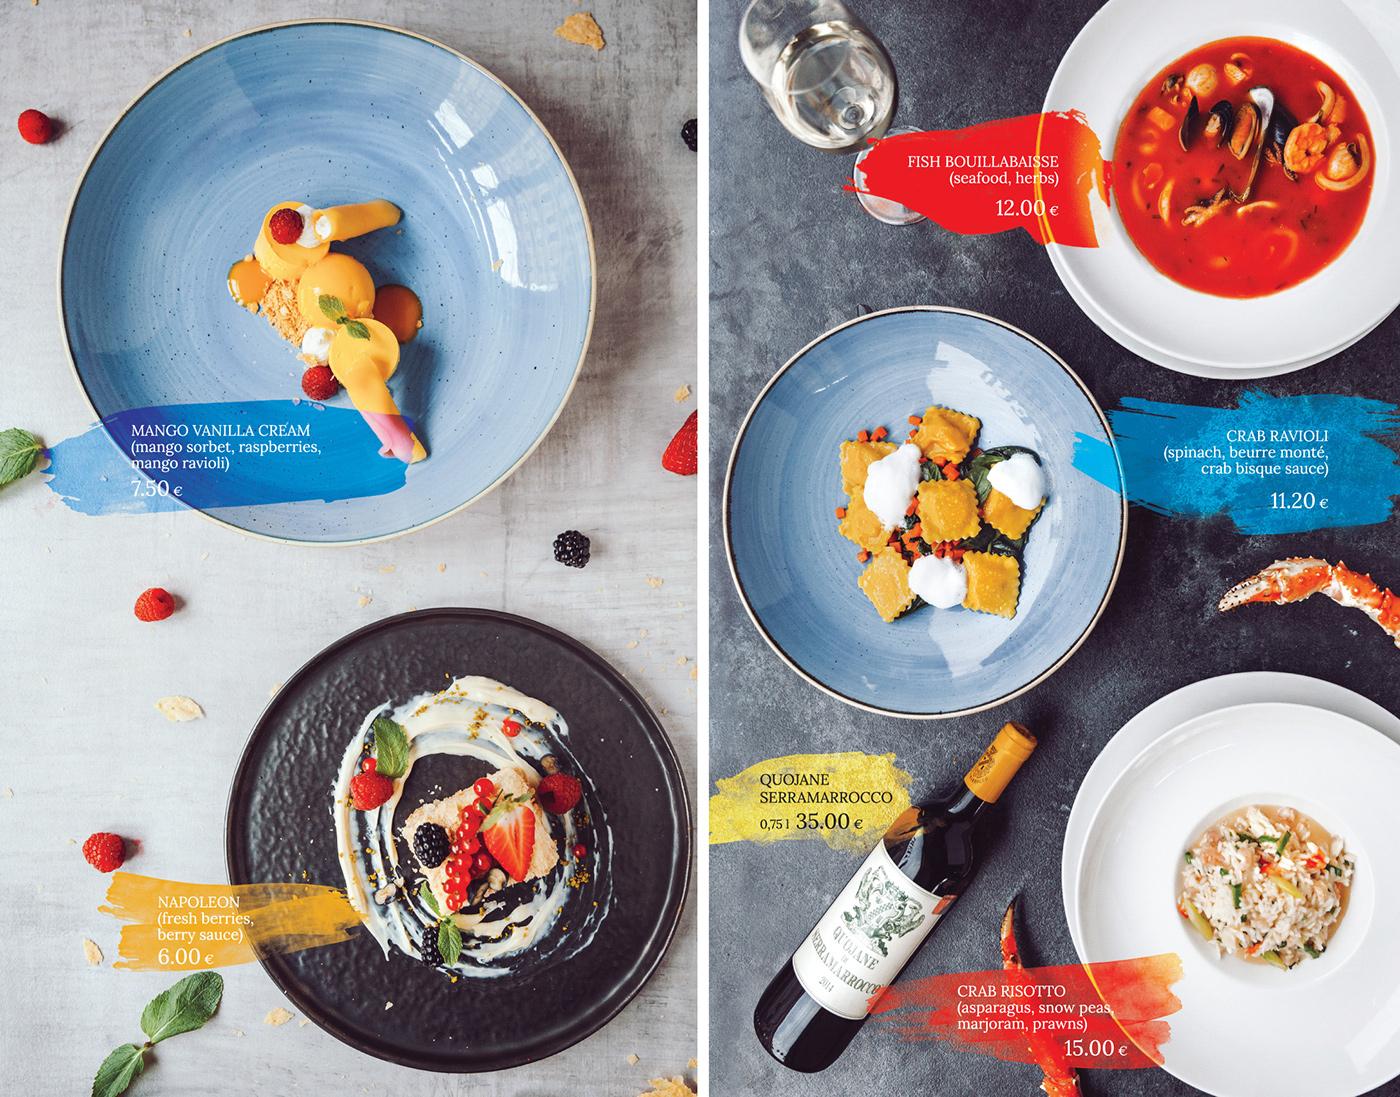 restaurant restaurant menu food photography Social Promotion high cuisine italian restaurant